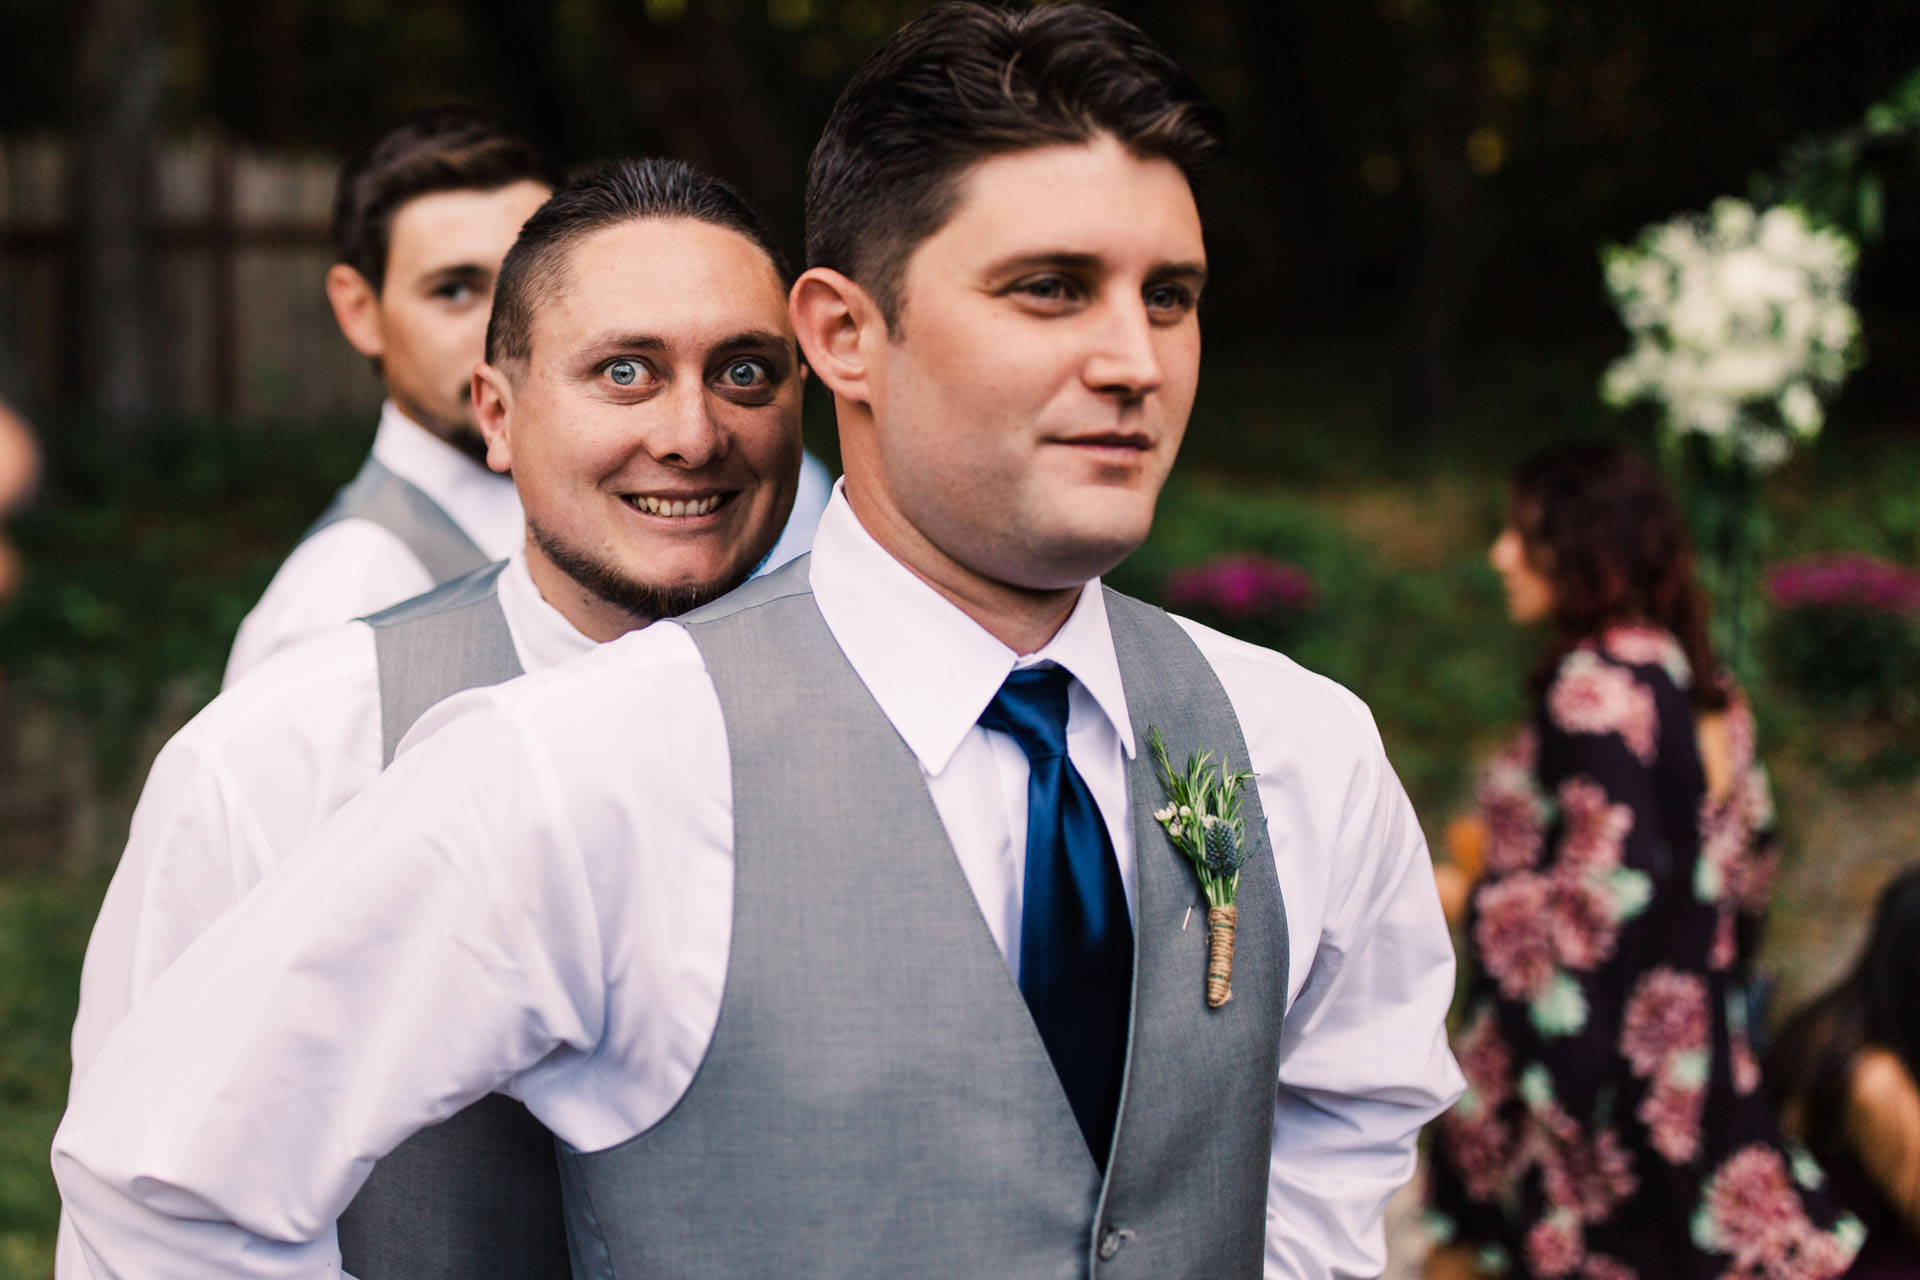 10-7-17 Devon and Jordan's Wedding-128.jpg